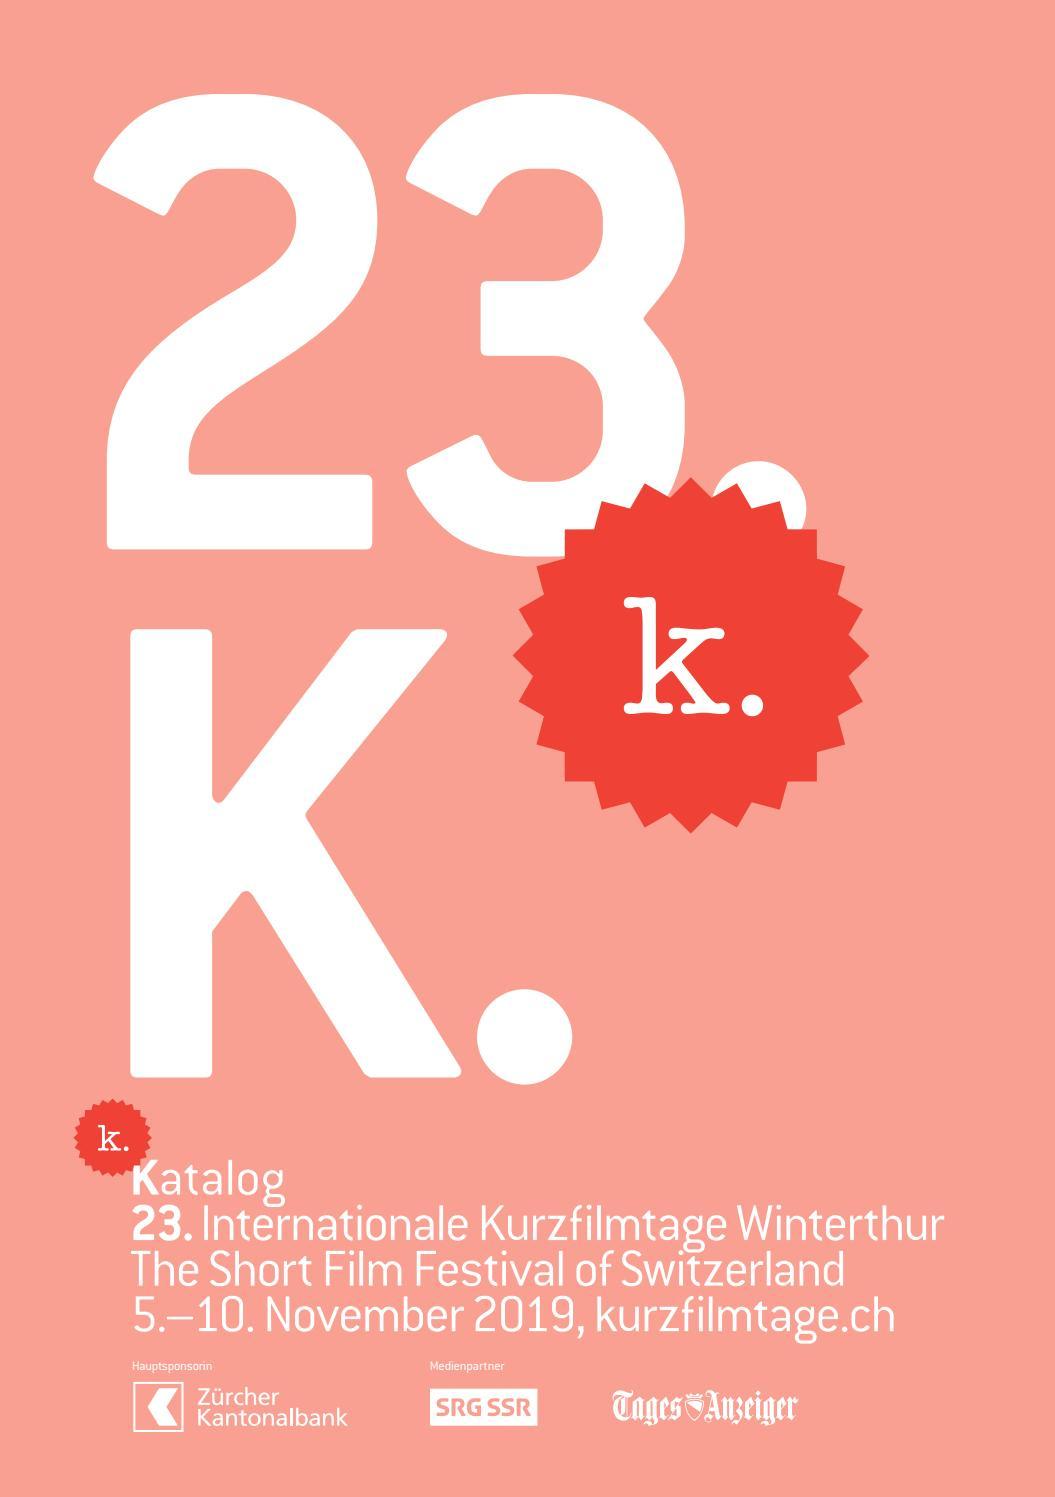 Katalog - 23. Internationale Kurzfilmtage Winterthur By Int tout Rallye Lecture Fr Ma Classe